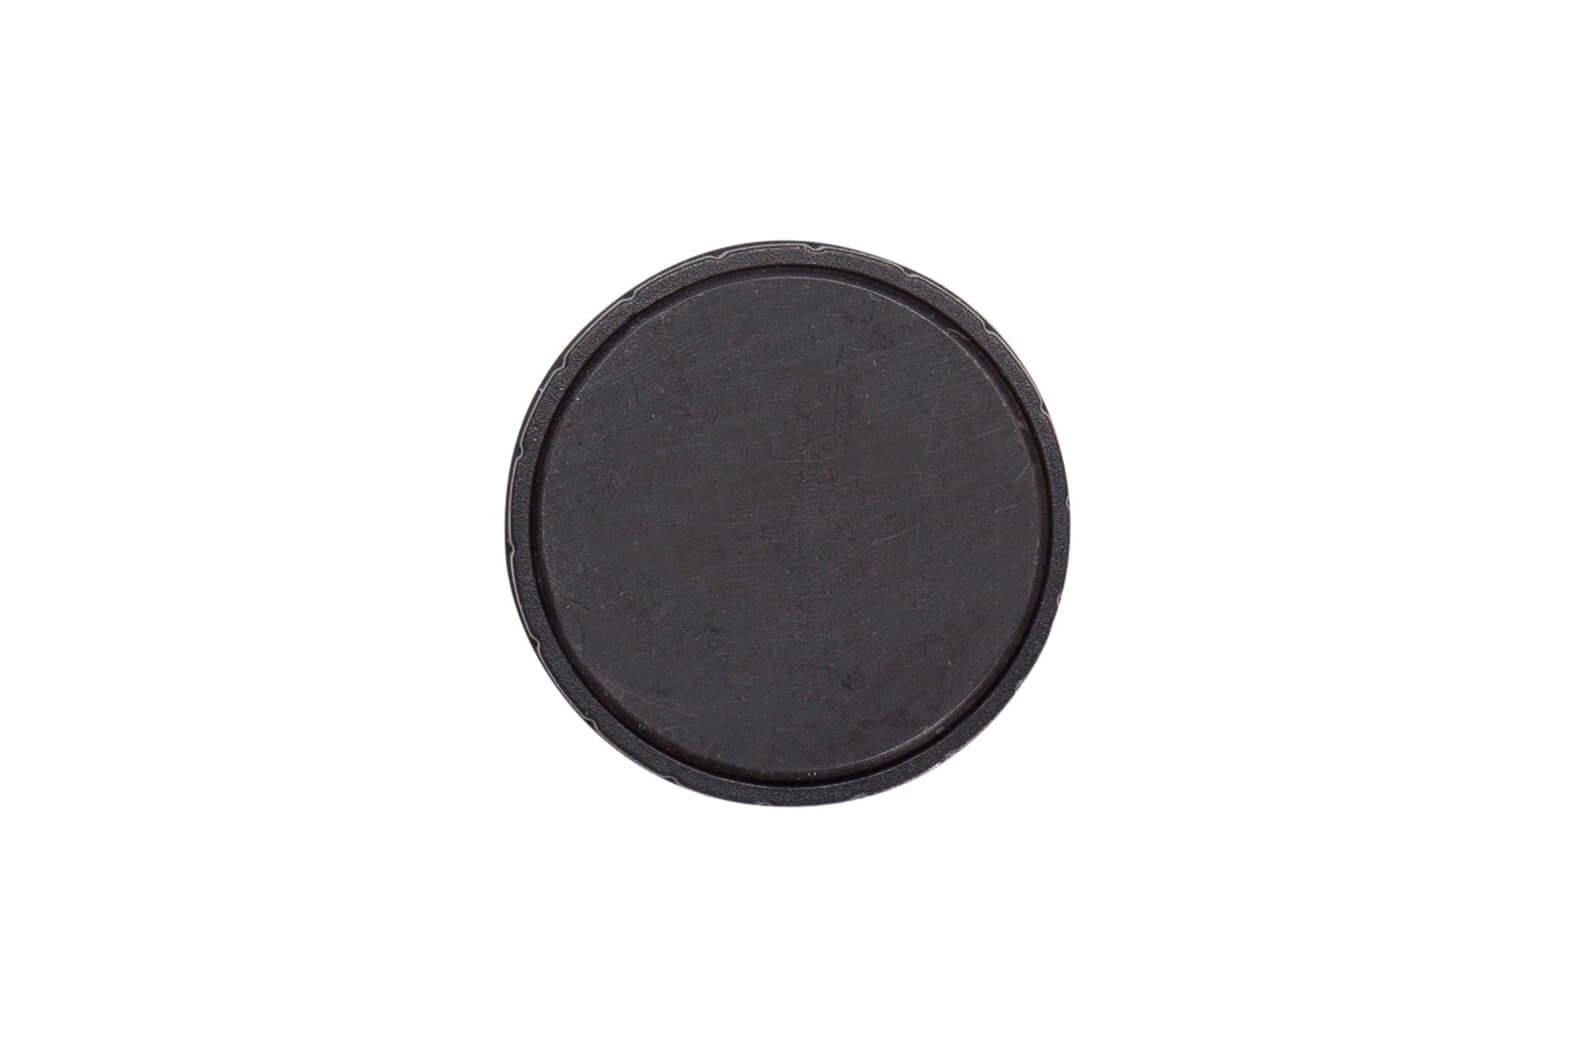 Magnet MAULsolid Ø 38 mm, 2,5 kg Haftkraft, 10 St./Ktn., schwarz